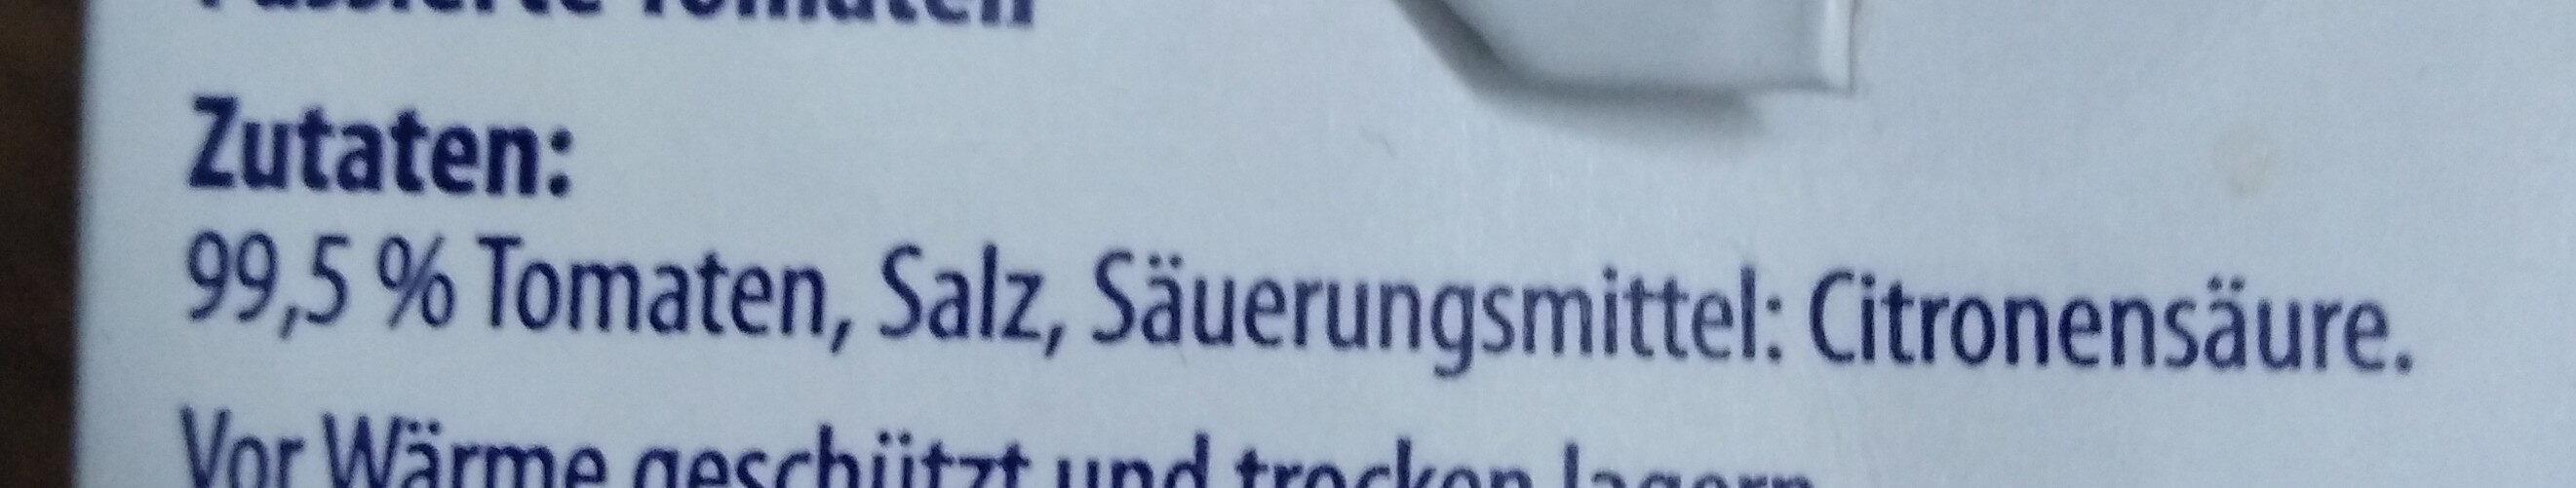 Tomaten passiert - Ingredients